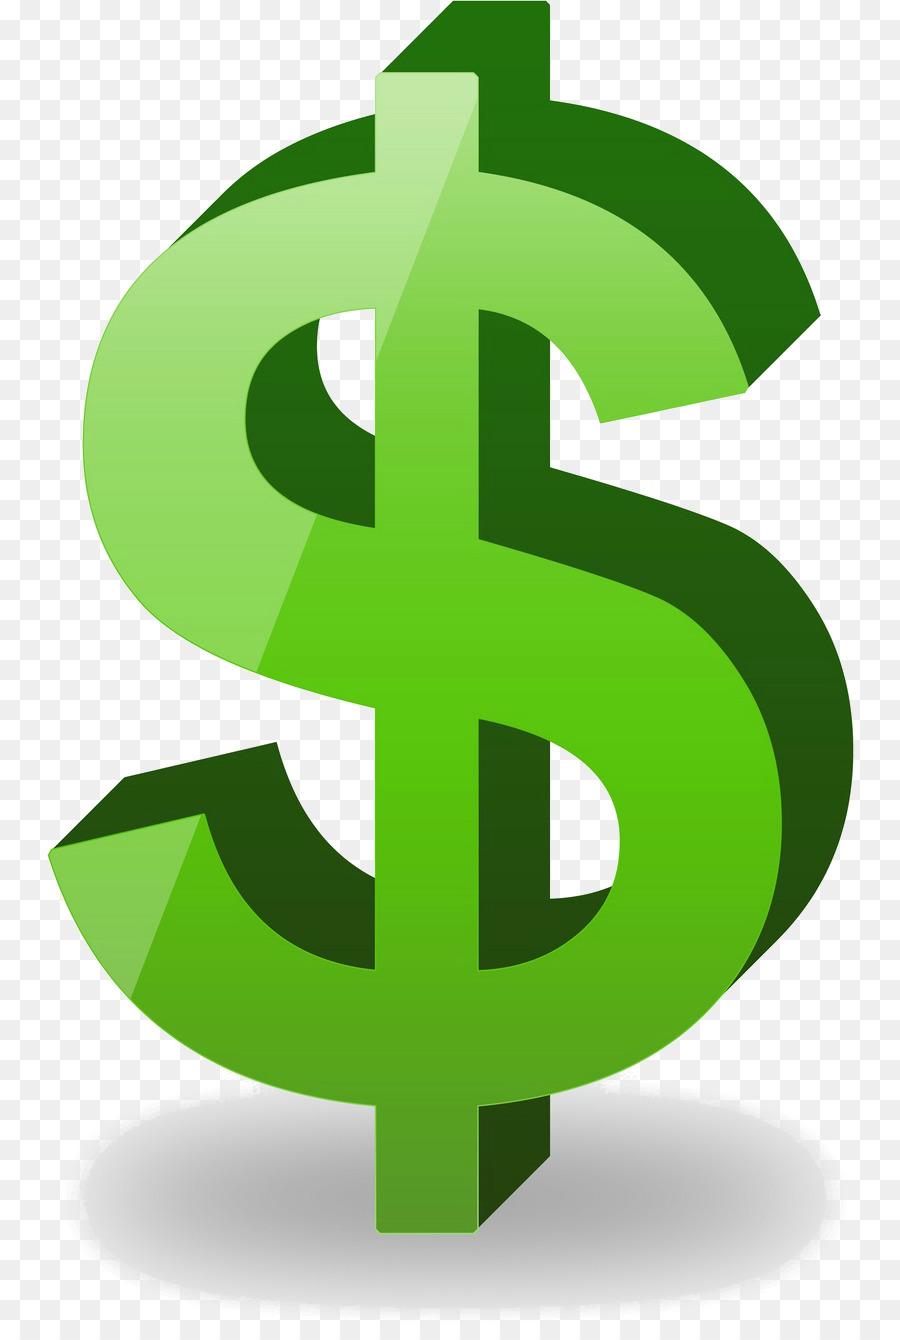 900x1340 Dollar Sign United States Dollar Currency Symbol Clip Art